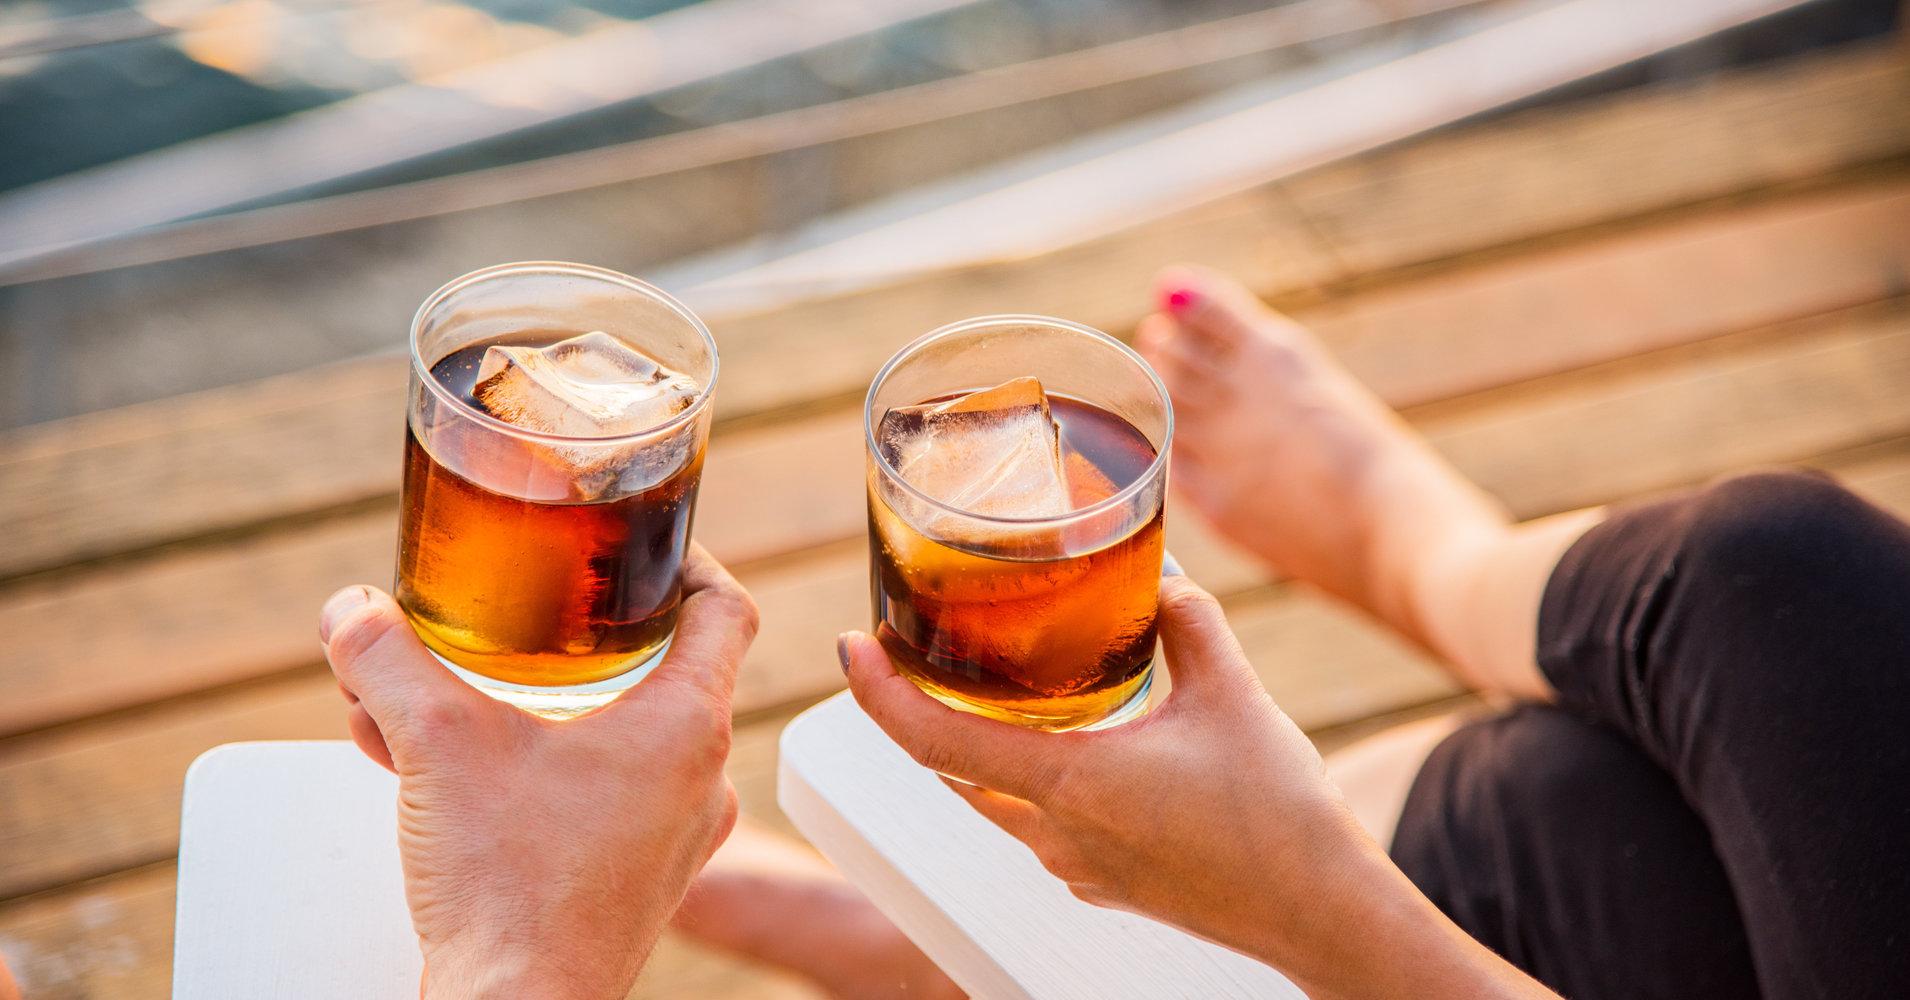 Exporting Rum to China